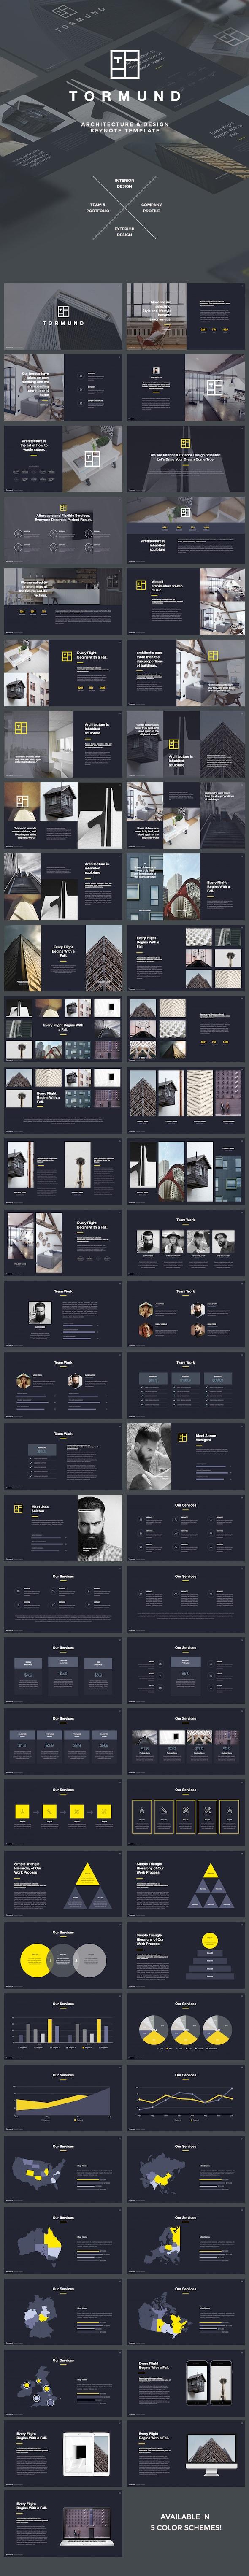 Thormund - Design & Portfolio Keynote Template - Keynote Templates Presentation Templates